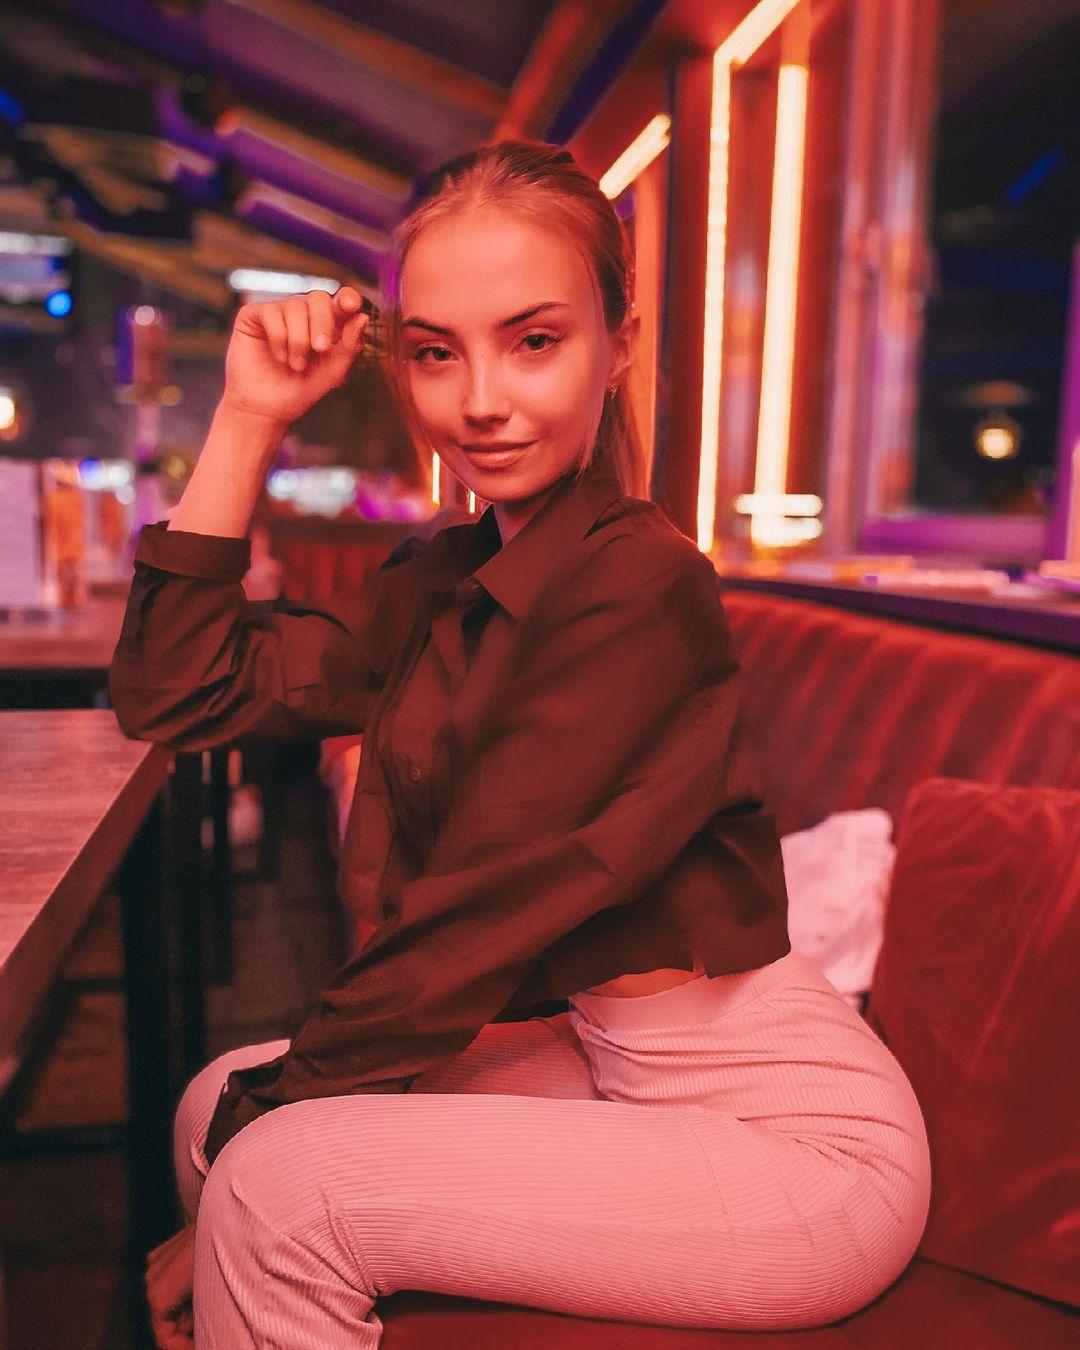 Anastasia-Fefilova-Wallpapers-Insta-Fit-Bio-7